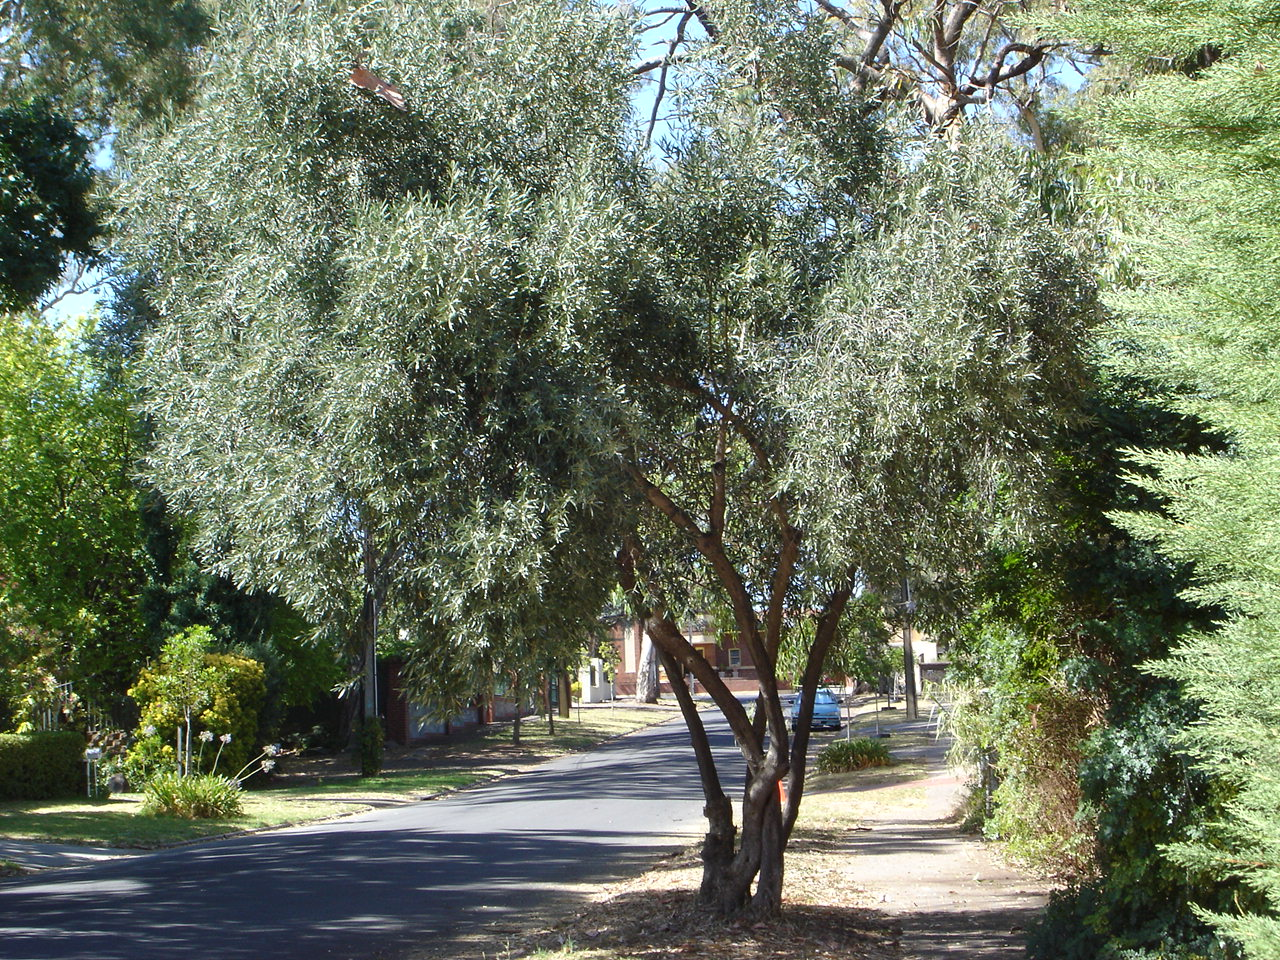 How to trim an ornamental olive tree garden design ideas for Trees garden of jane delawney blogspot